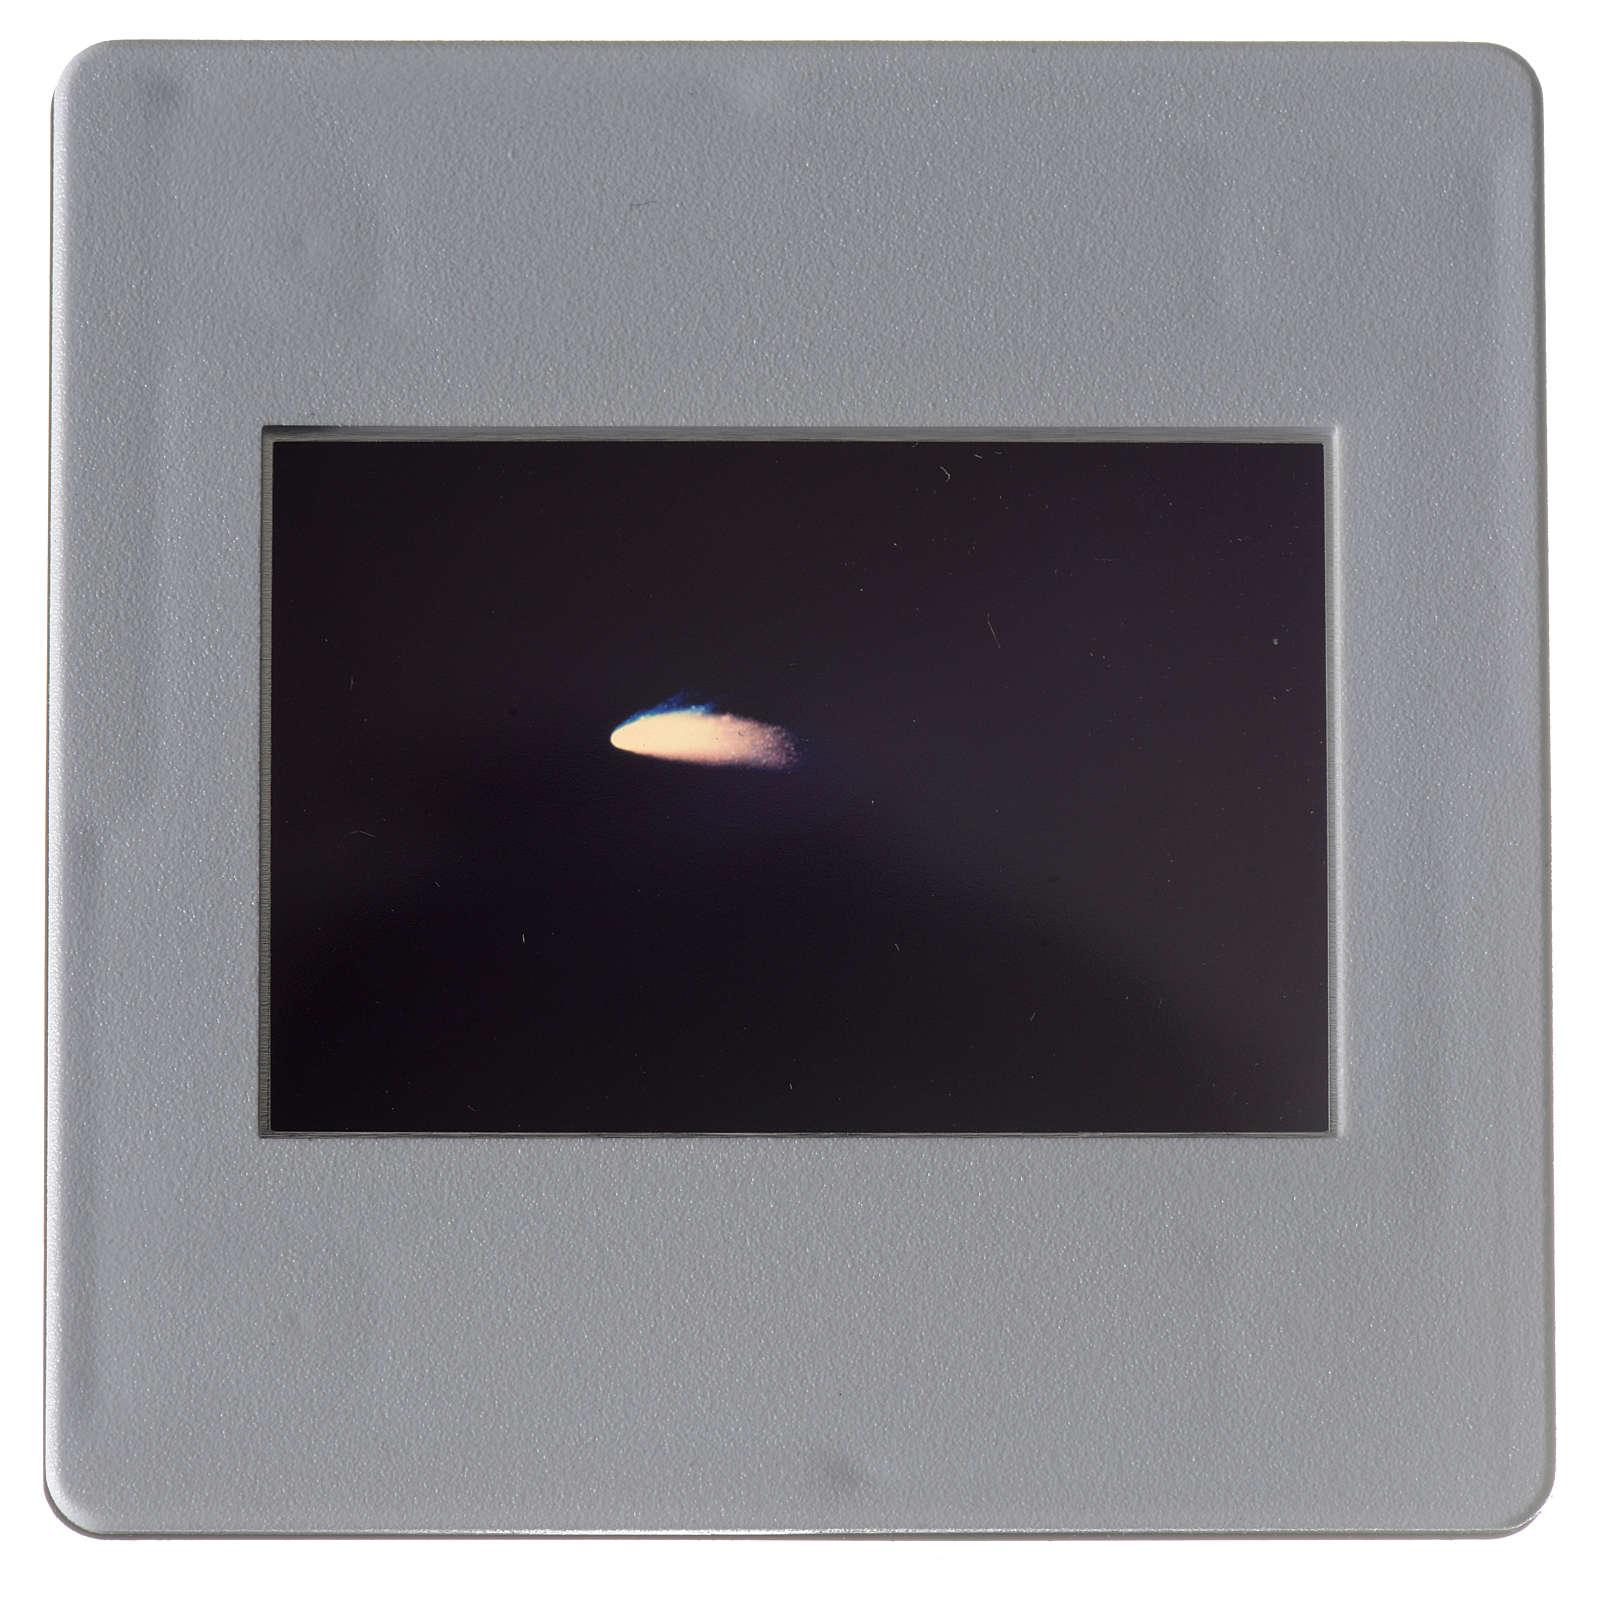 Diapositiva presepe Cometa Hale Bopp 4